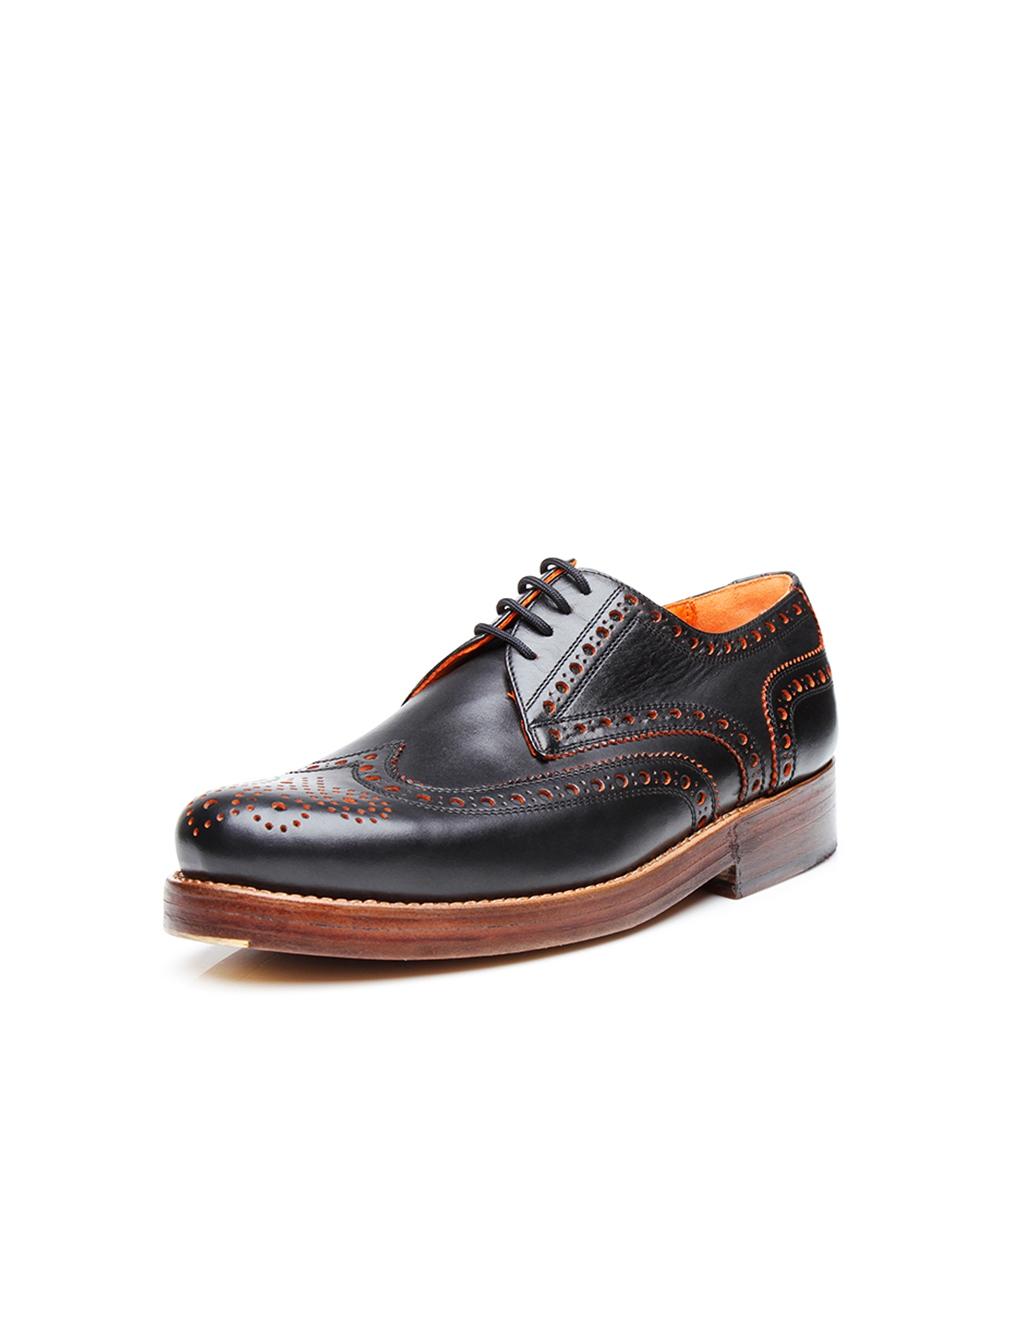 Original Budapest Mens Shoe D Island Shoes Slip On British Comfort Leather Dark Brown Discontinued Model